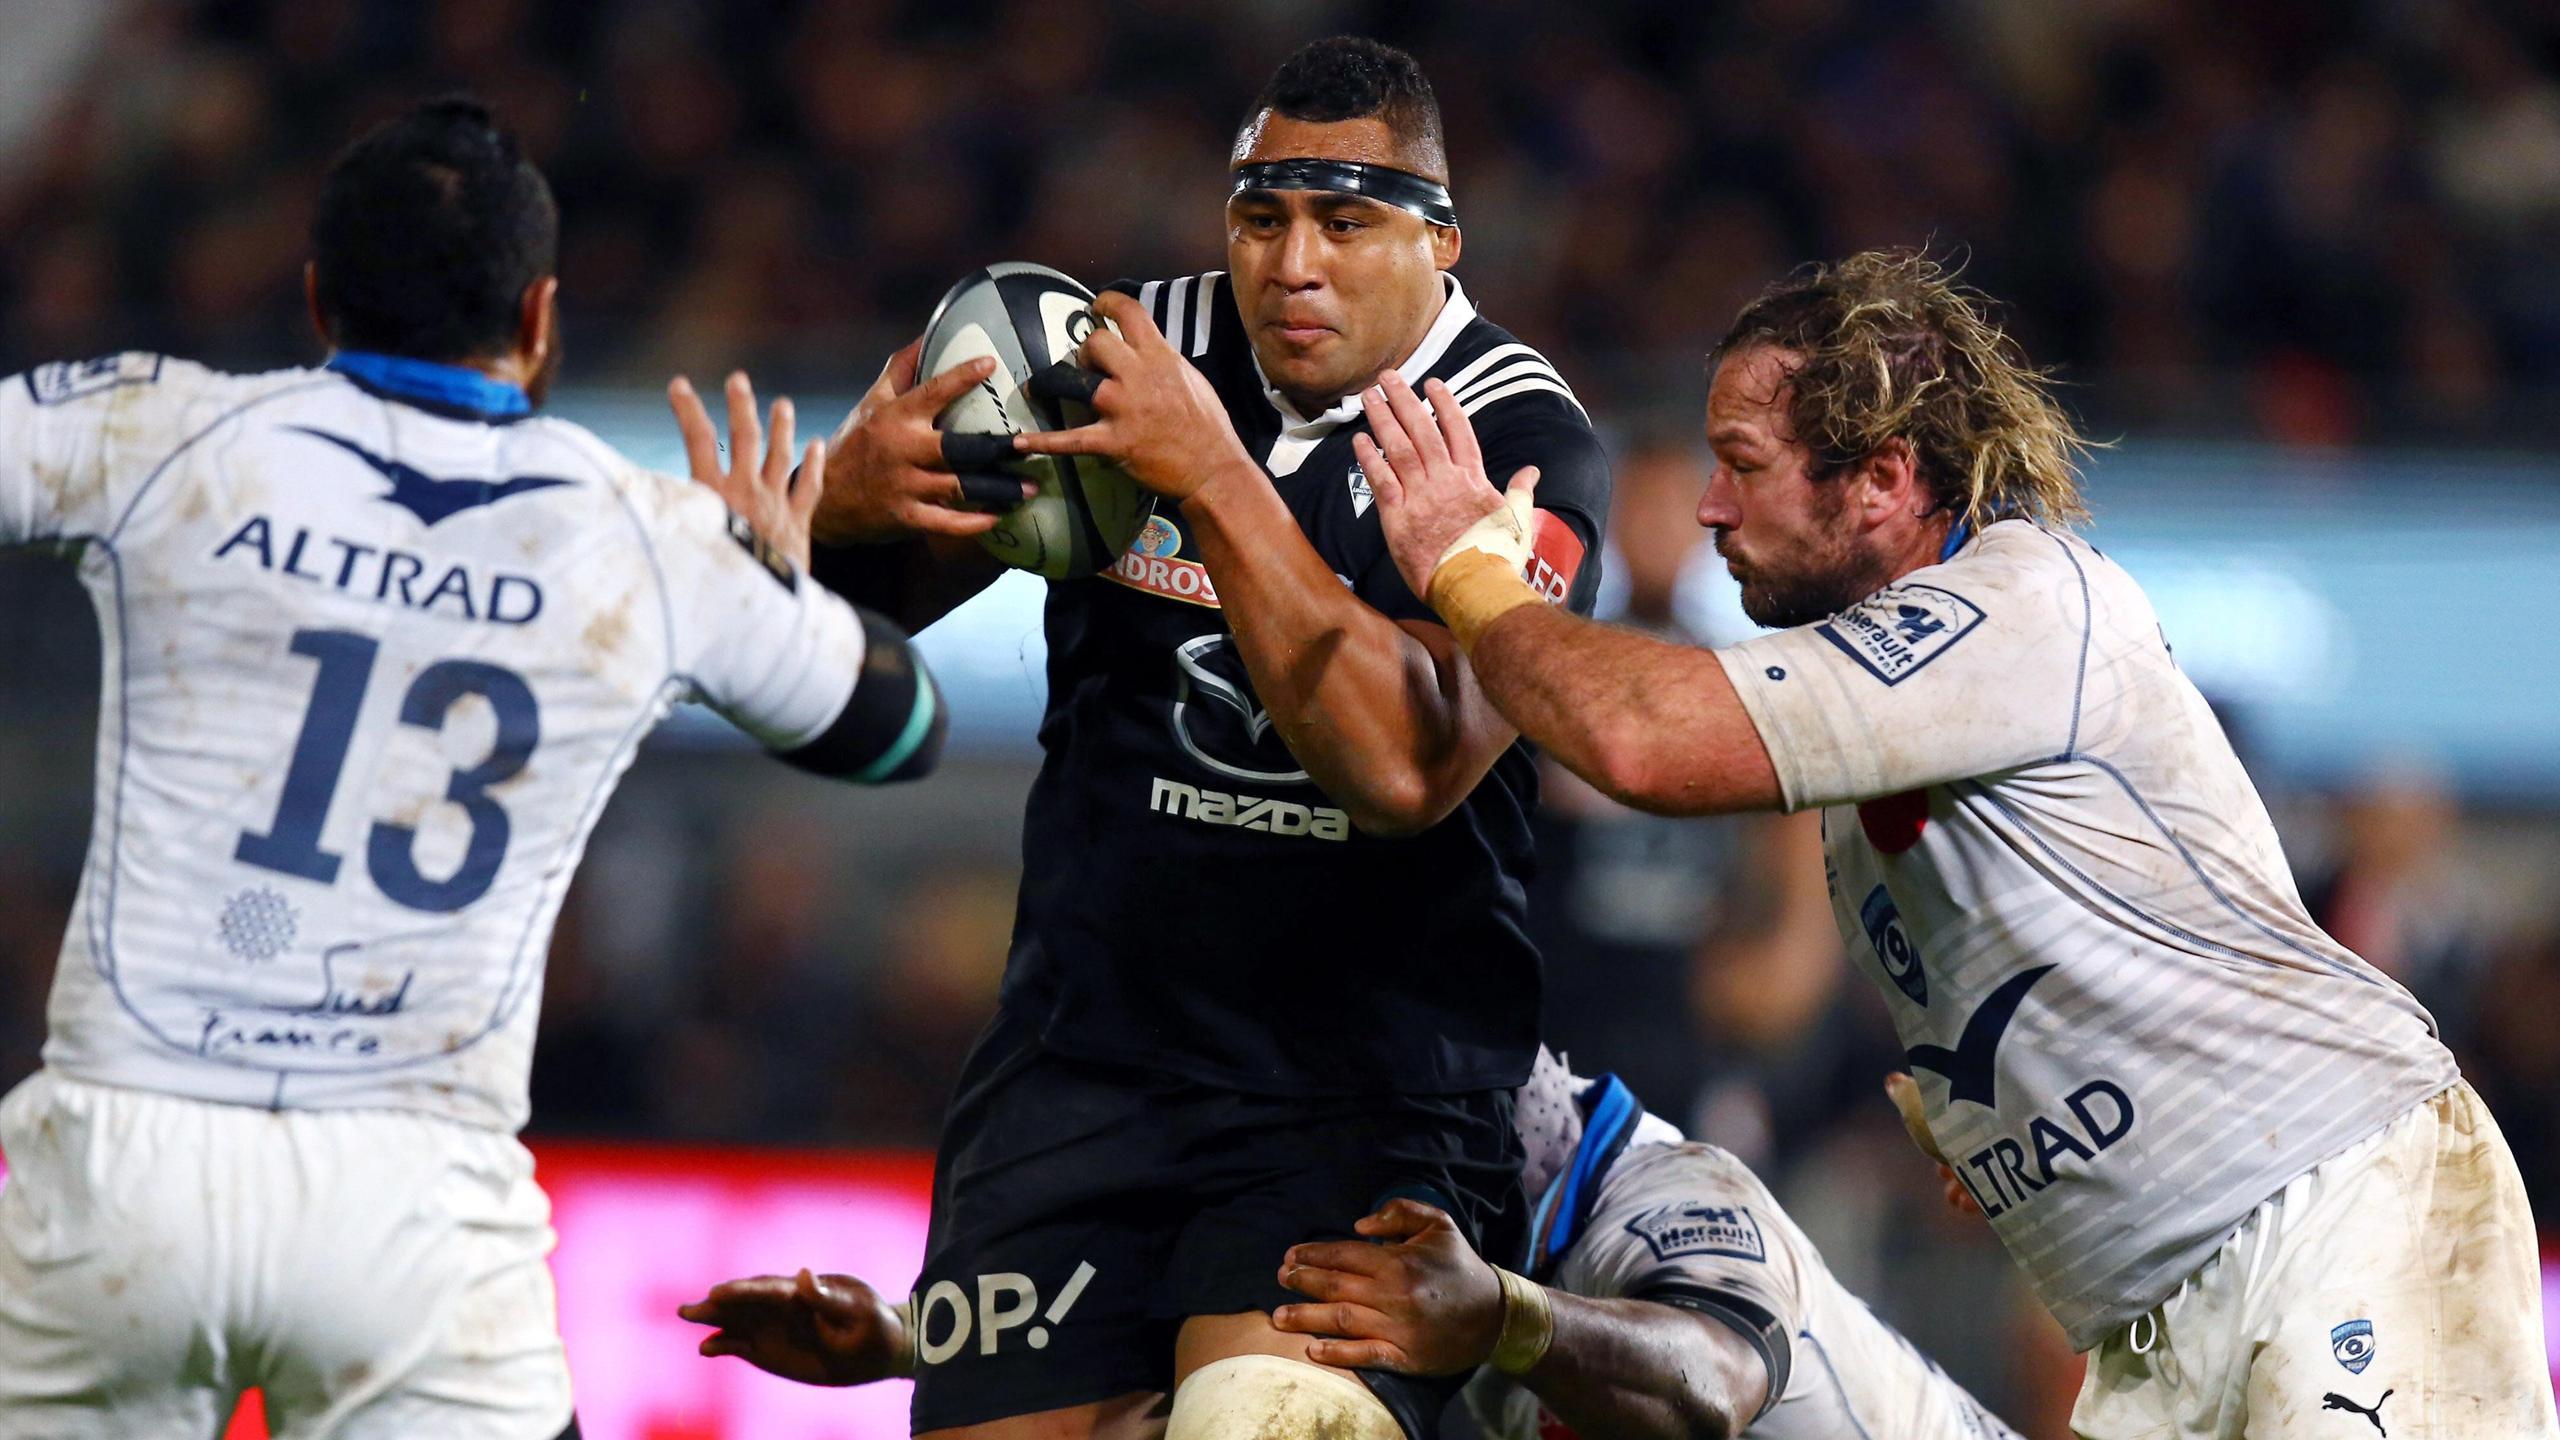 Sisaro Koyamaibole (Brive) sonne la charge face à Montpellier